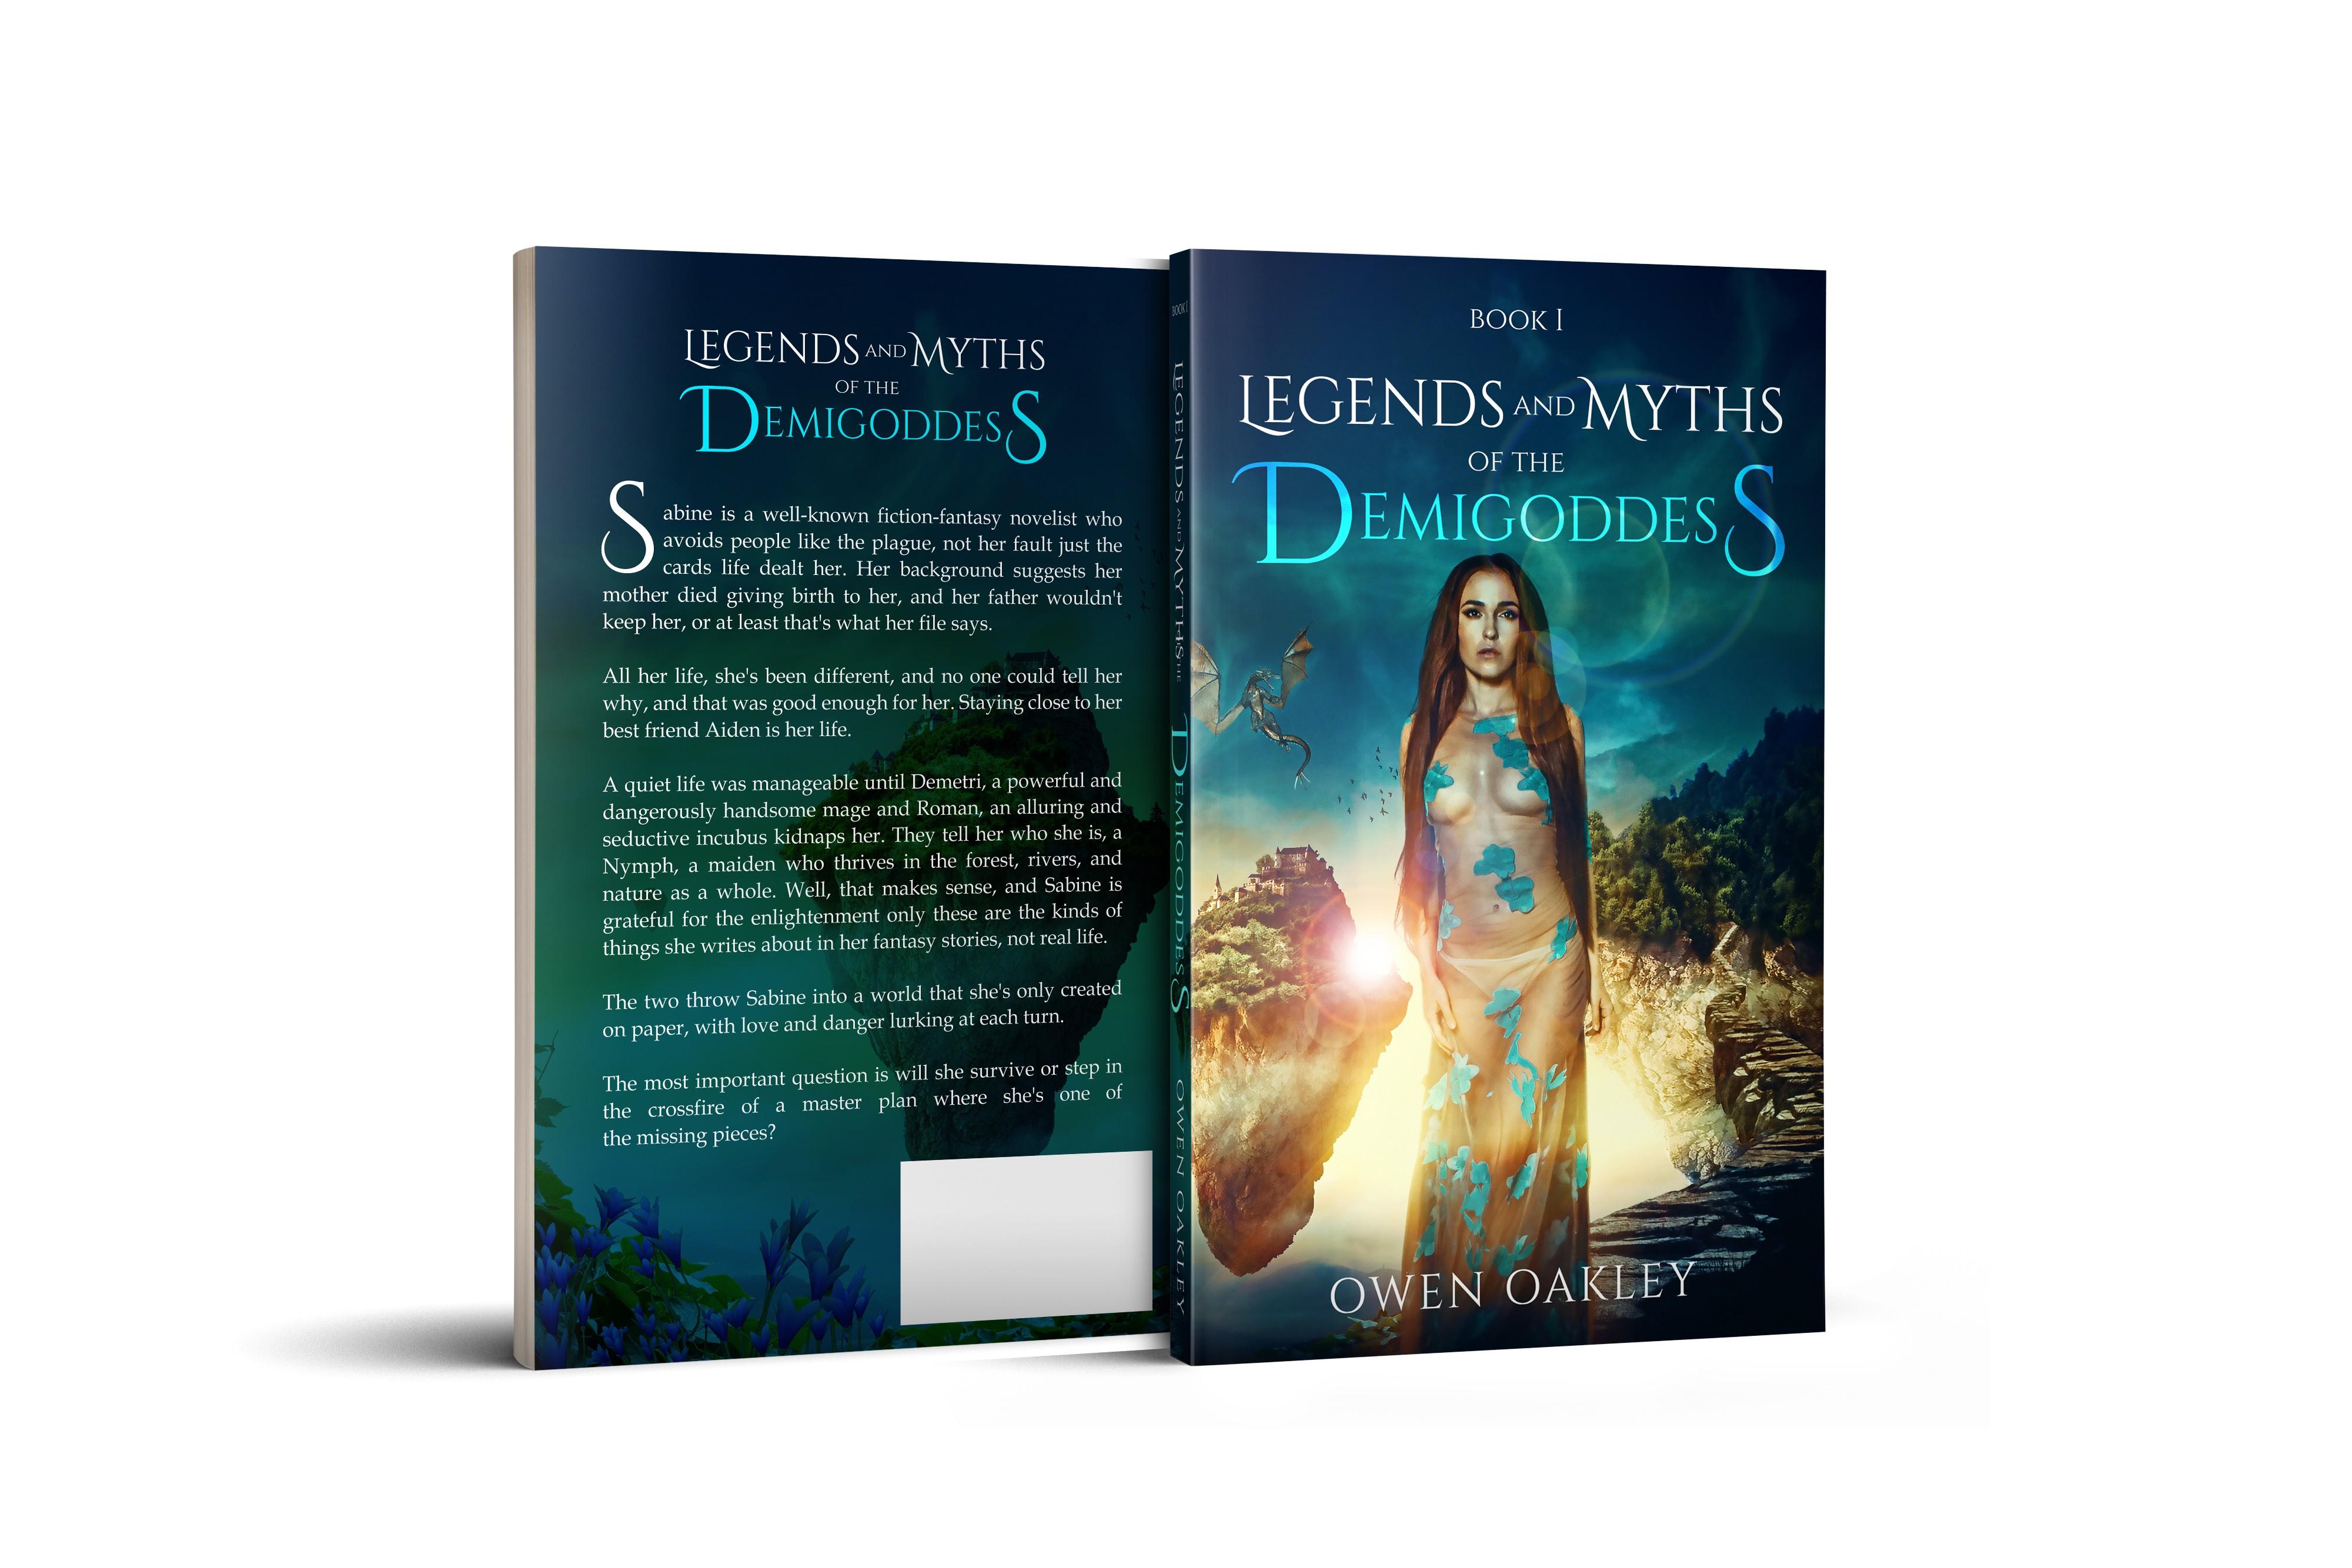 Legends and Myths The Demigoddess Book I